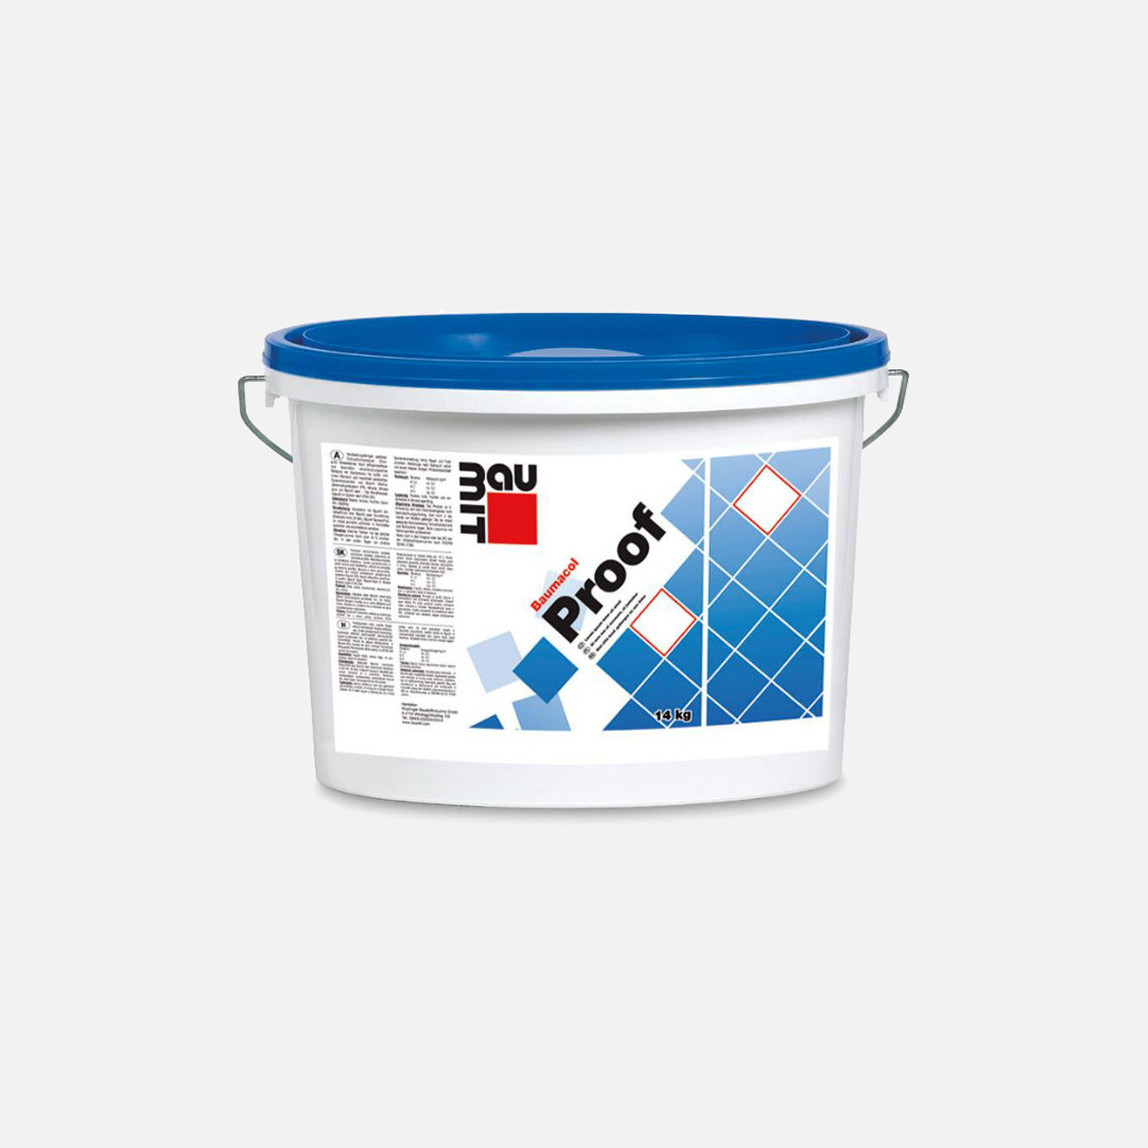 Baumacol Proof (Likit Su Yalıtım Mlz) 7kg